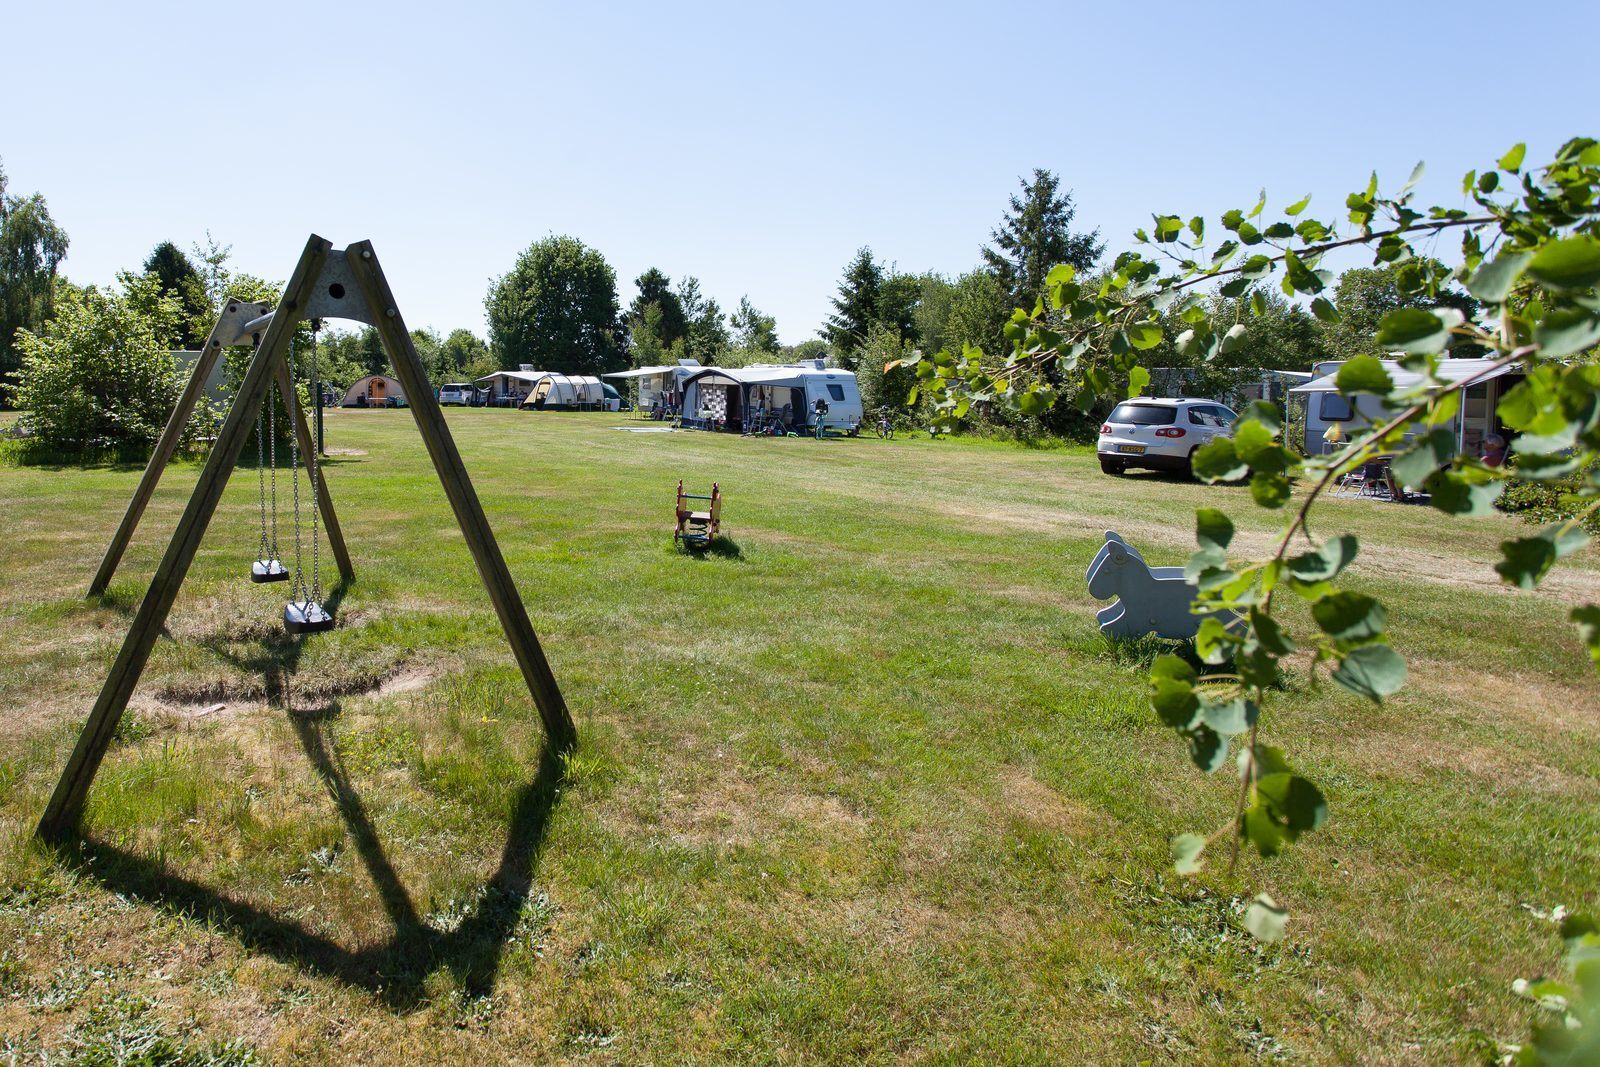 Camping in midden Drenthe